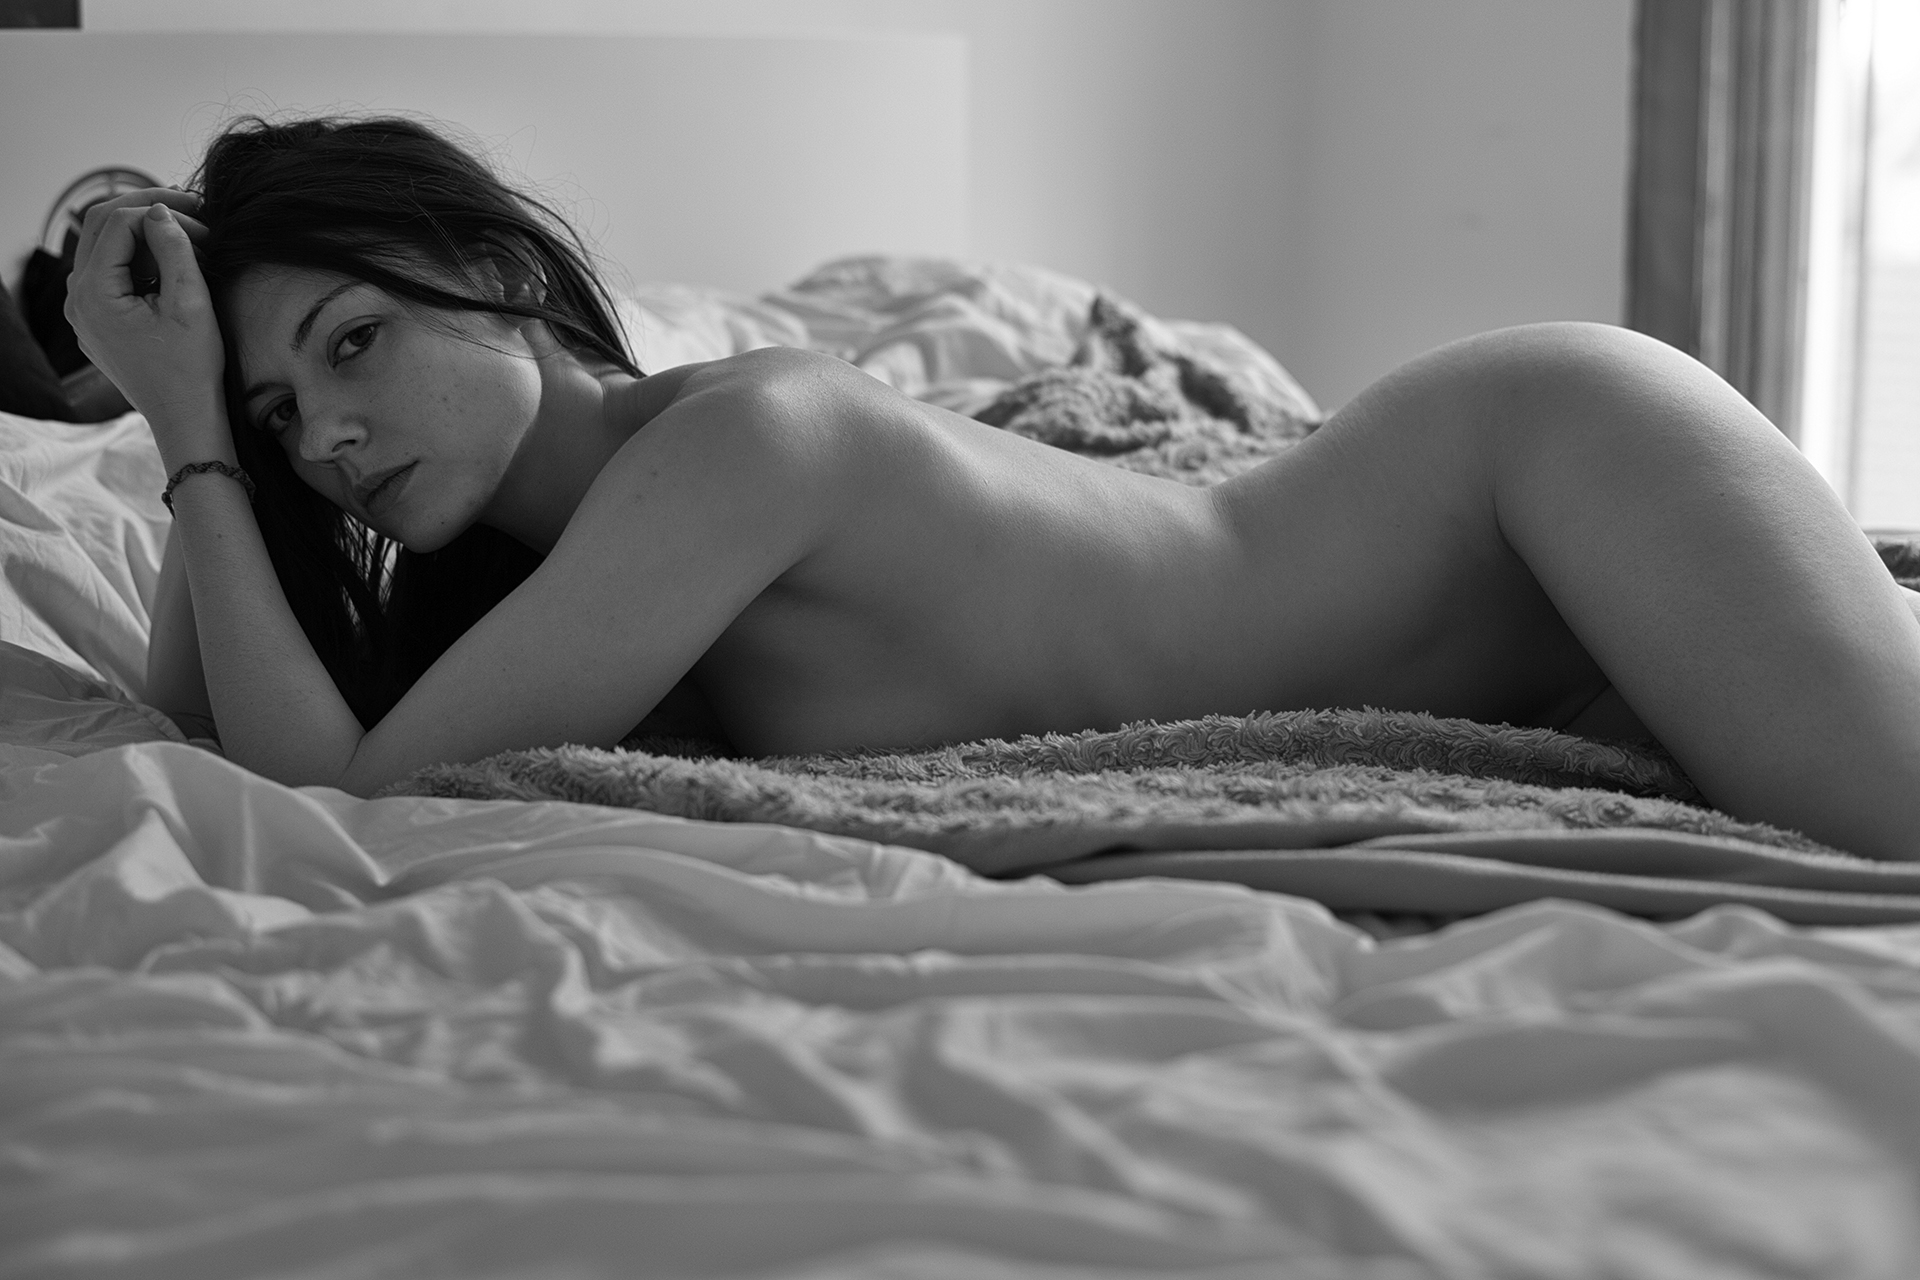 © Copyrigth - Alexandre Cicconi